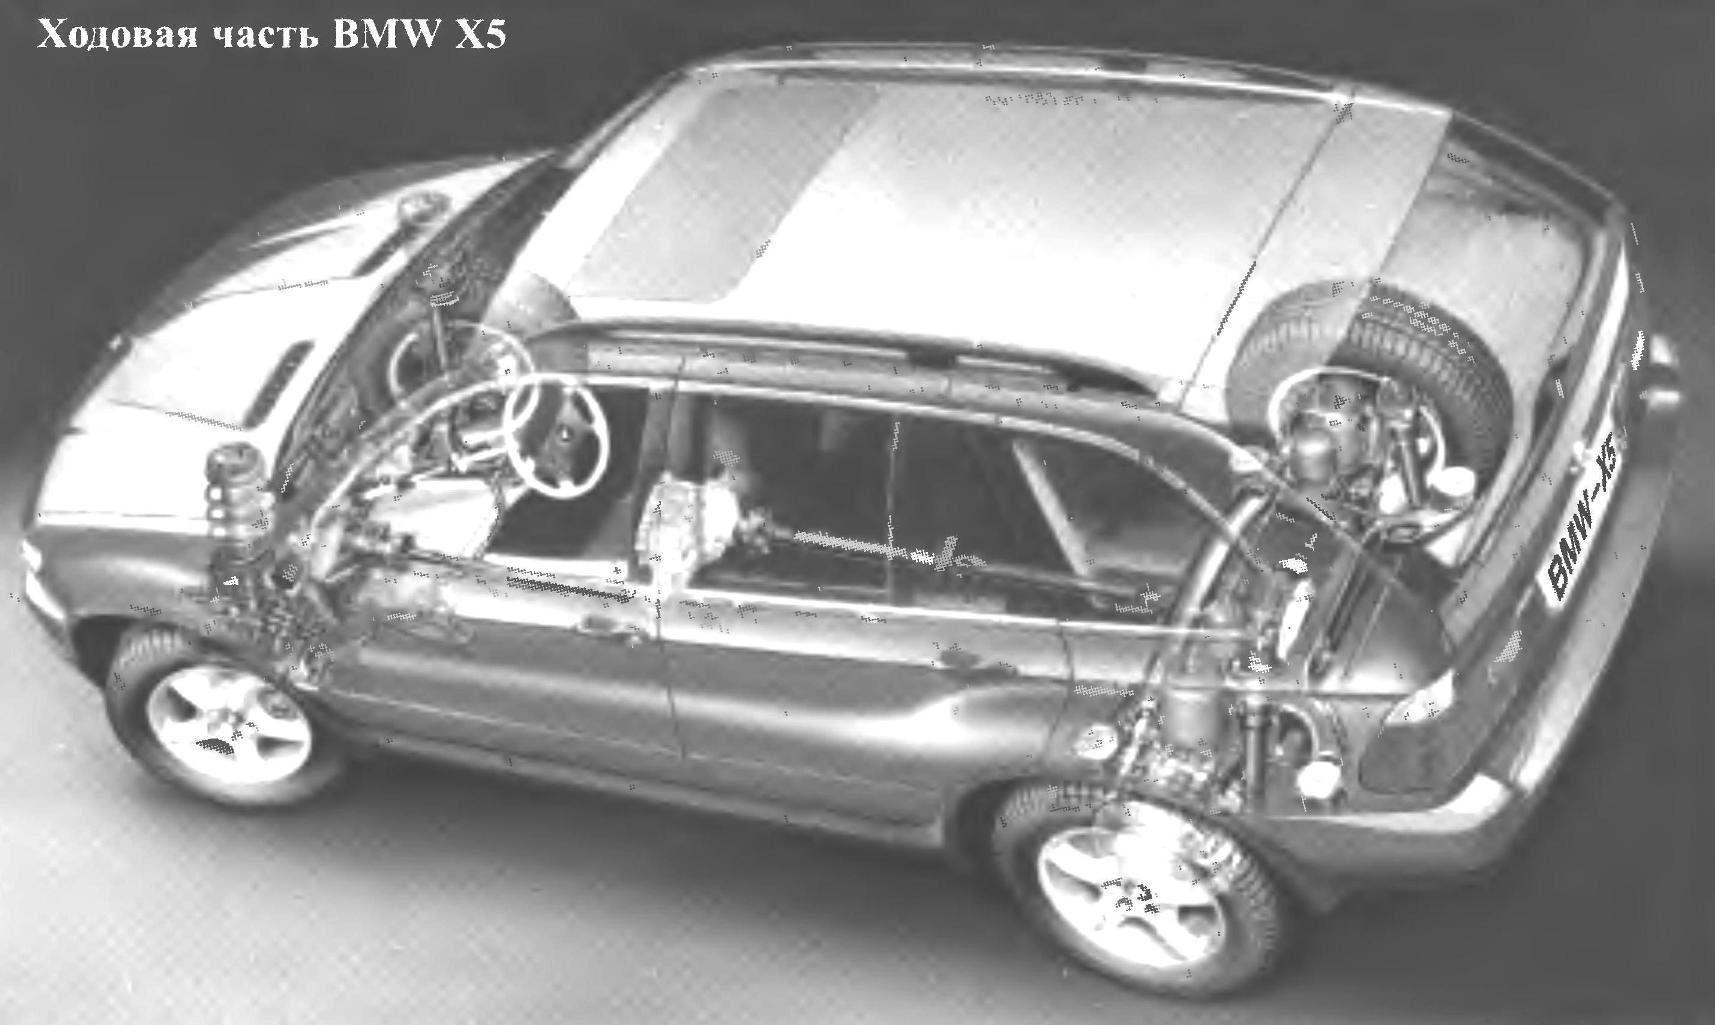 Suspension BMW X5